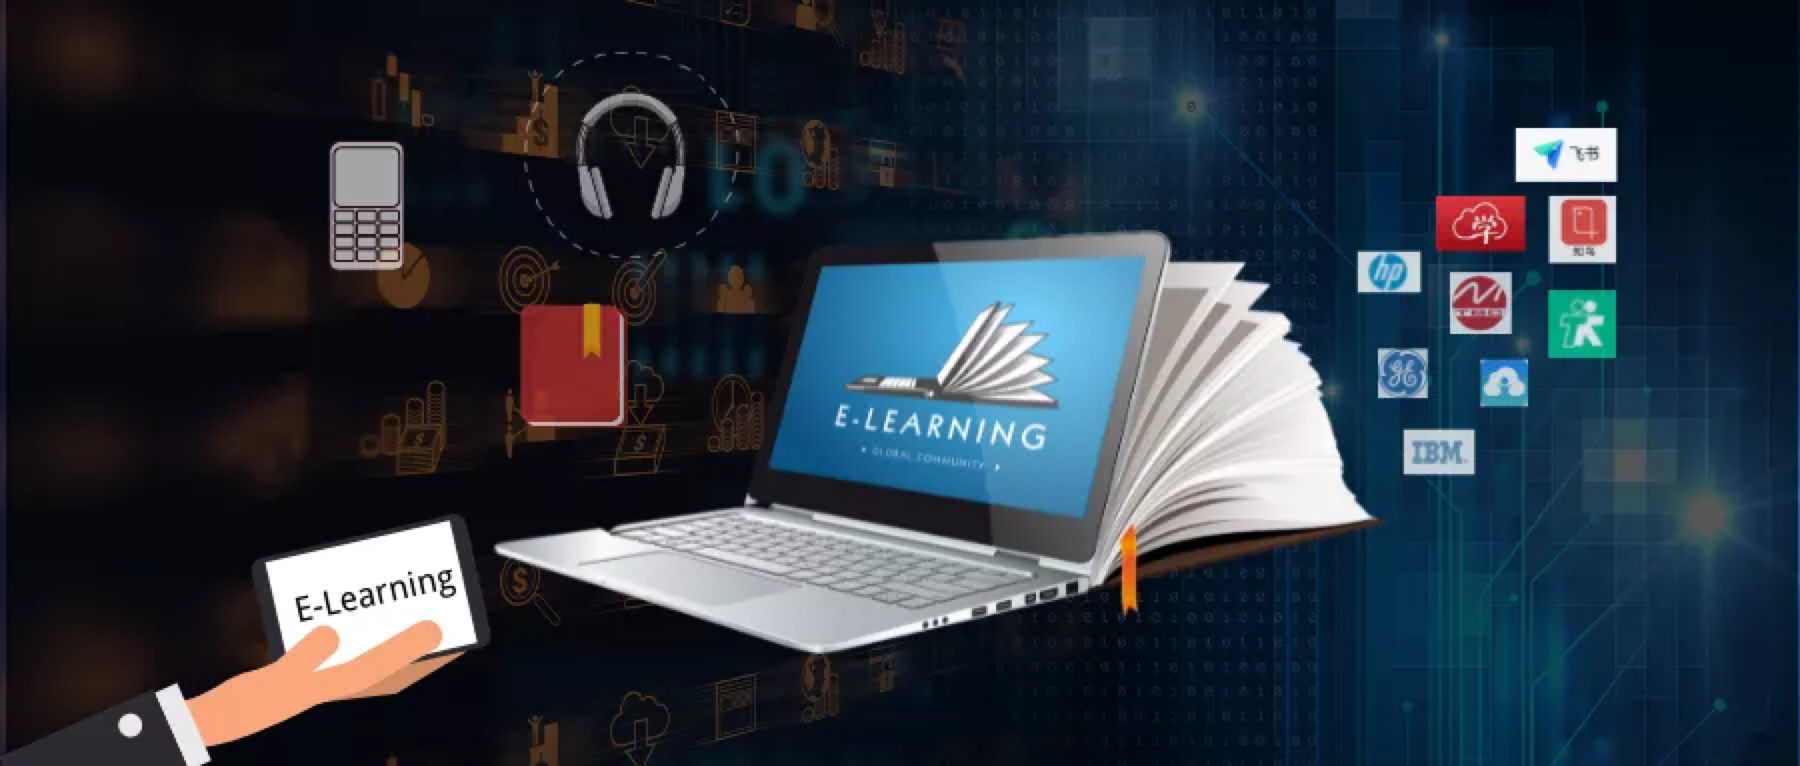 E-learning 20 年,人口红利消失能否撬动近万亿市场?